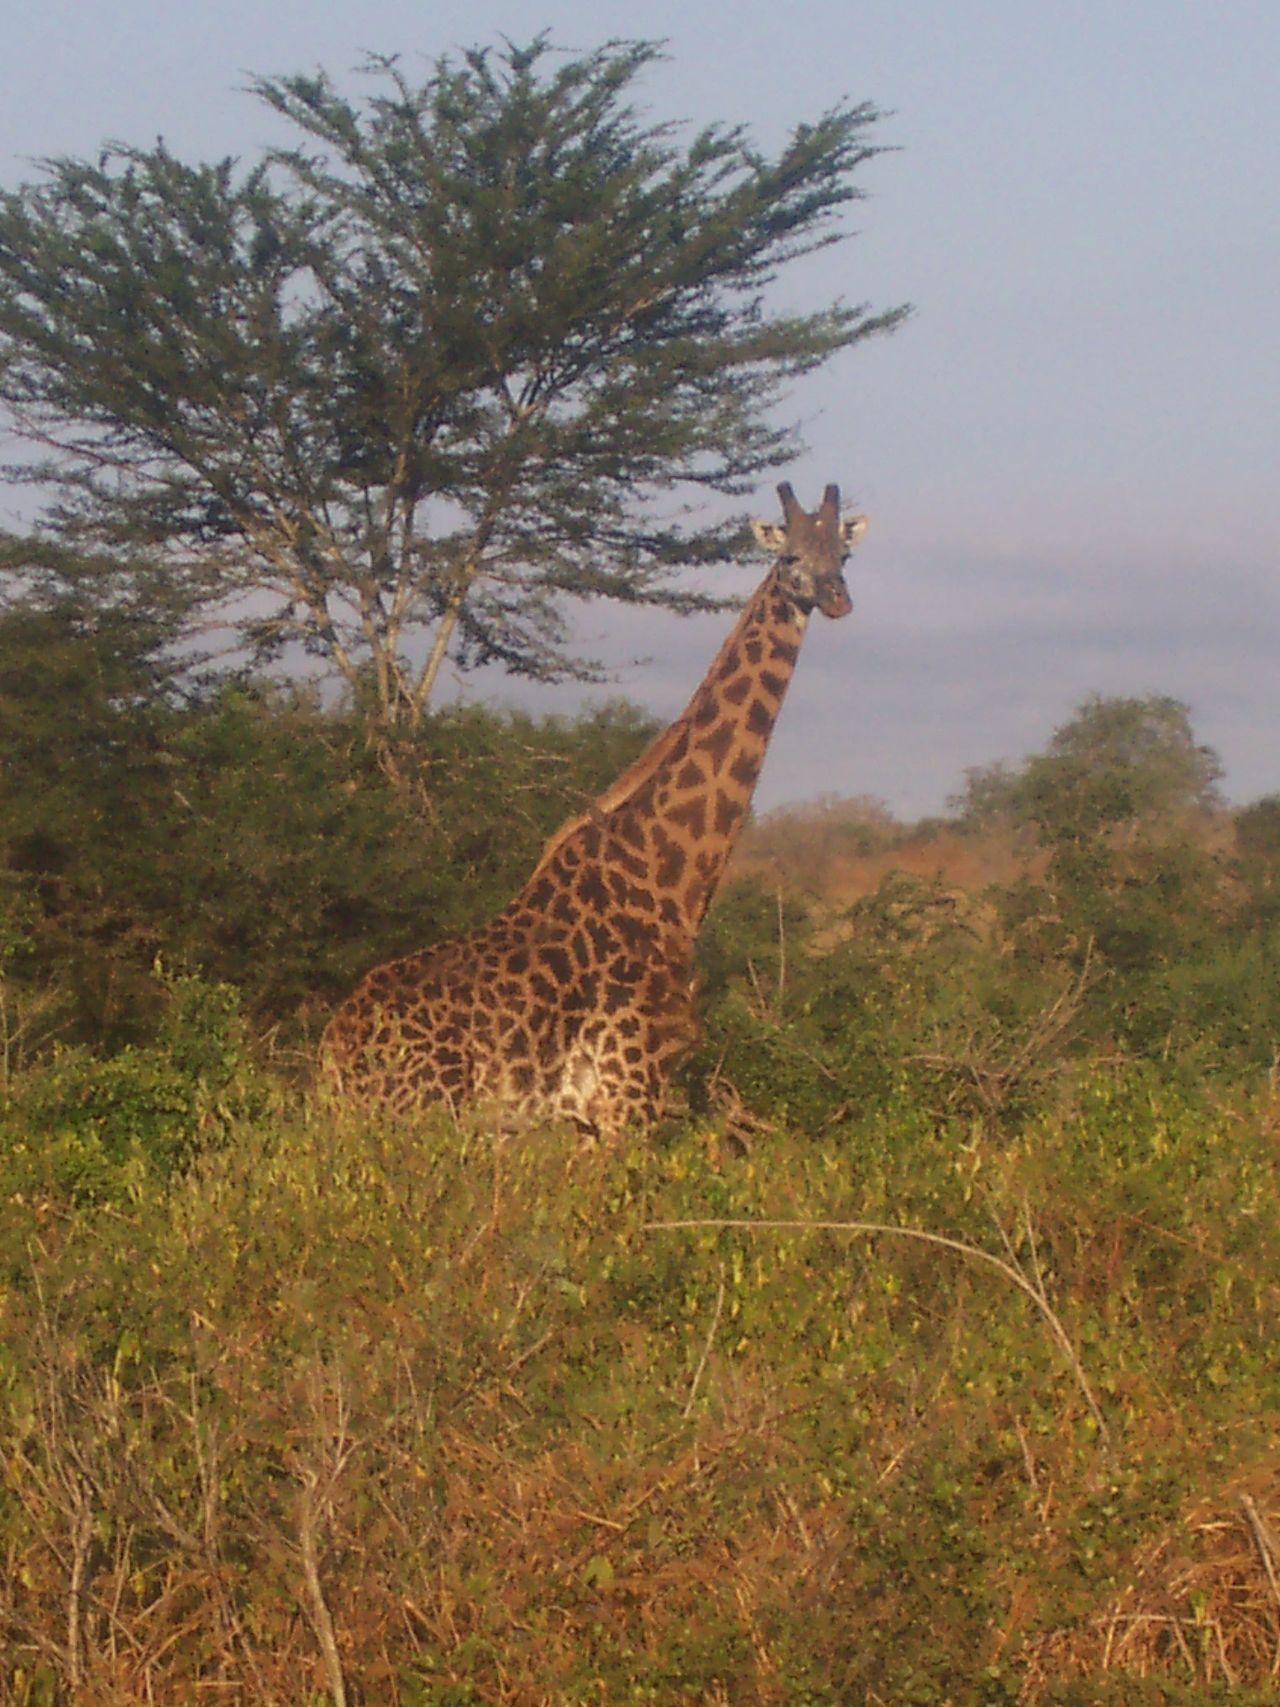 #Nature  #NoFilter #giraffe #kenya #nofiltertravel #safari #travel #travelphotography #wildlife #wildlifephotography Animals In The Wild